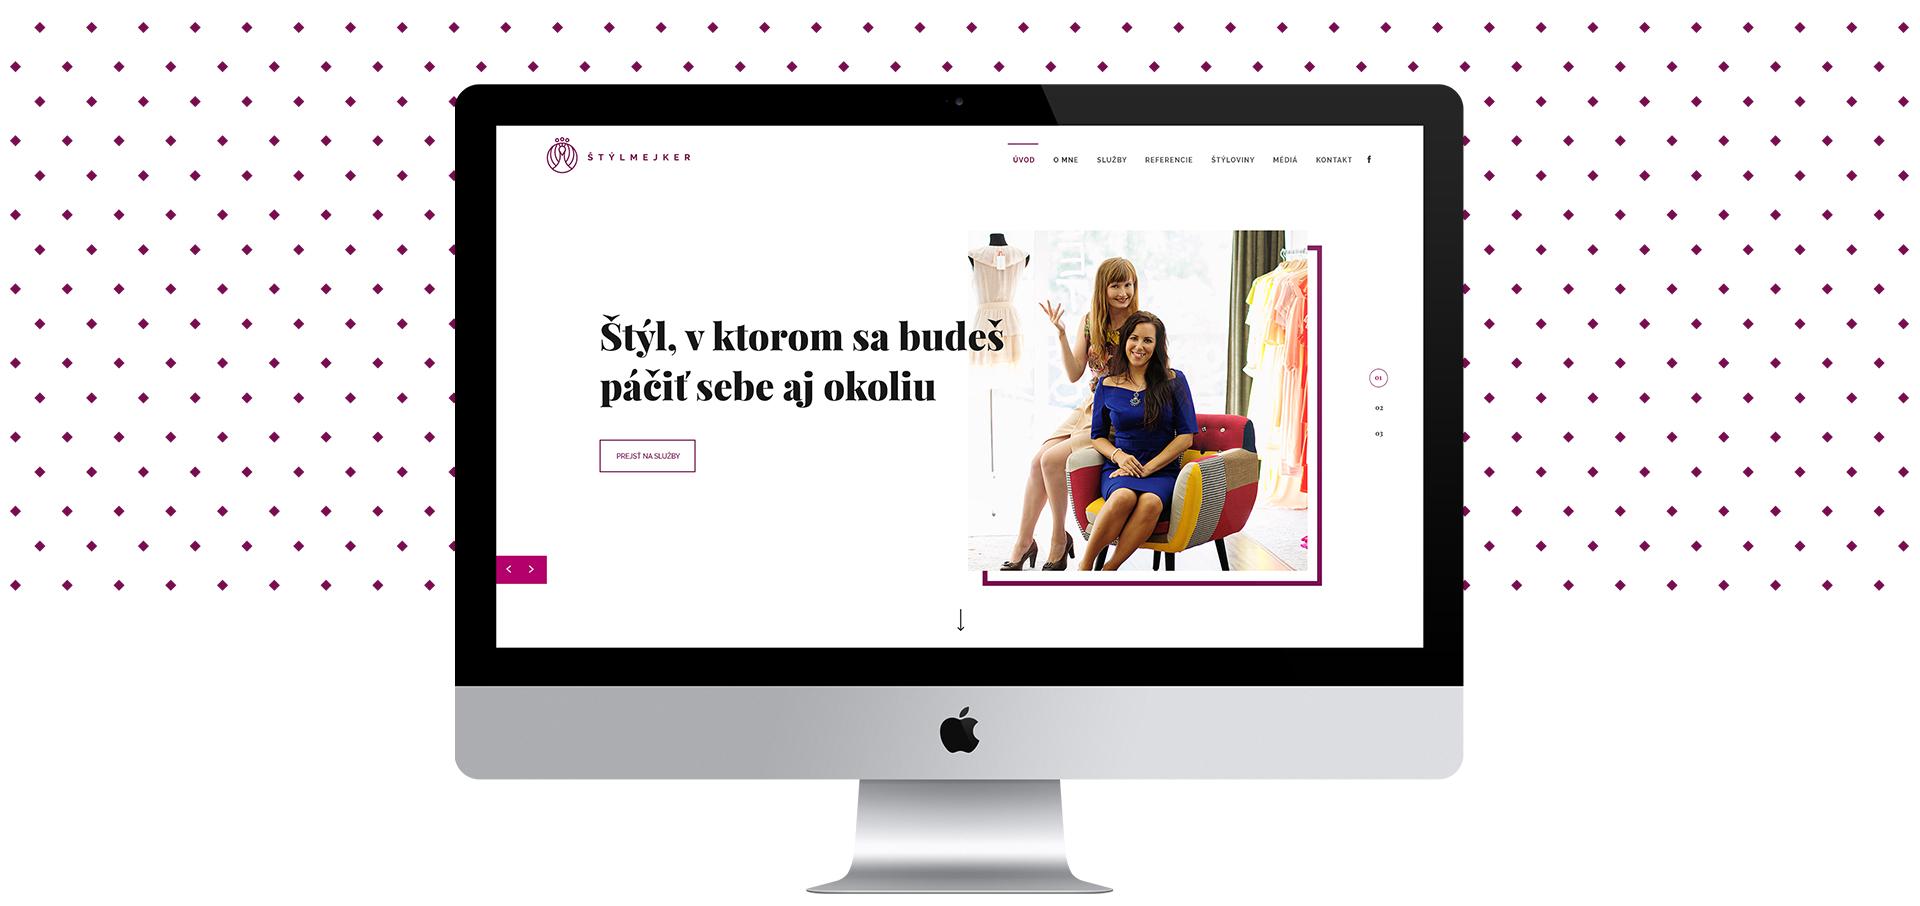 Stylmejker_webdesign